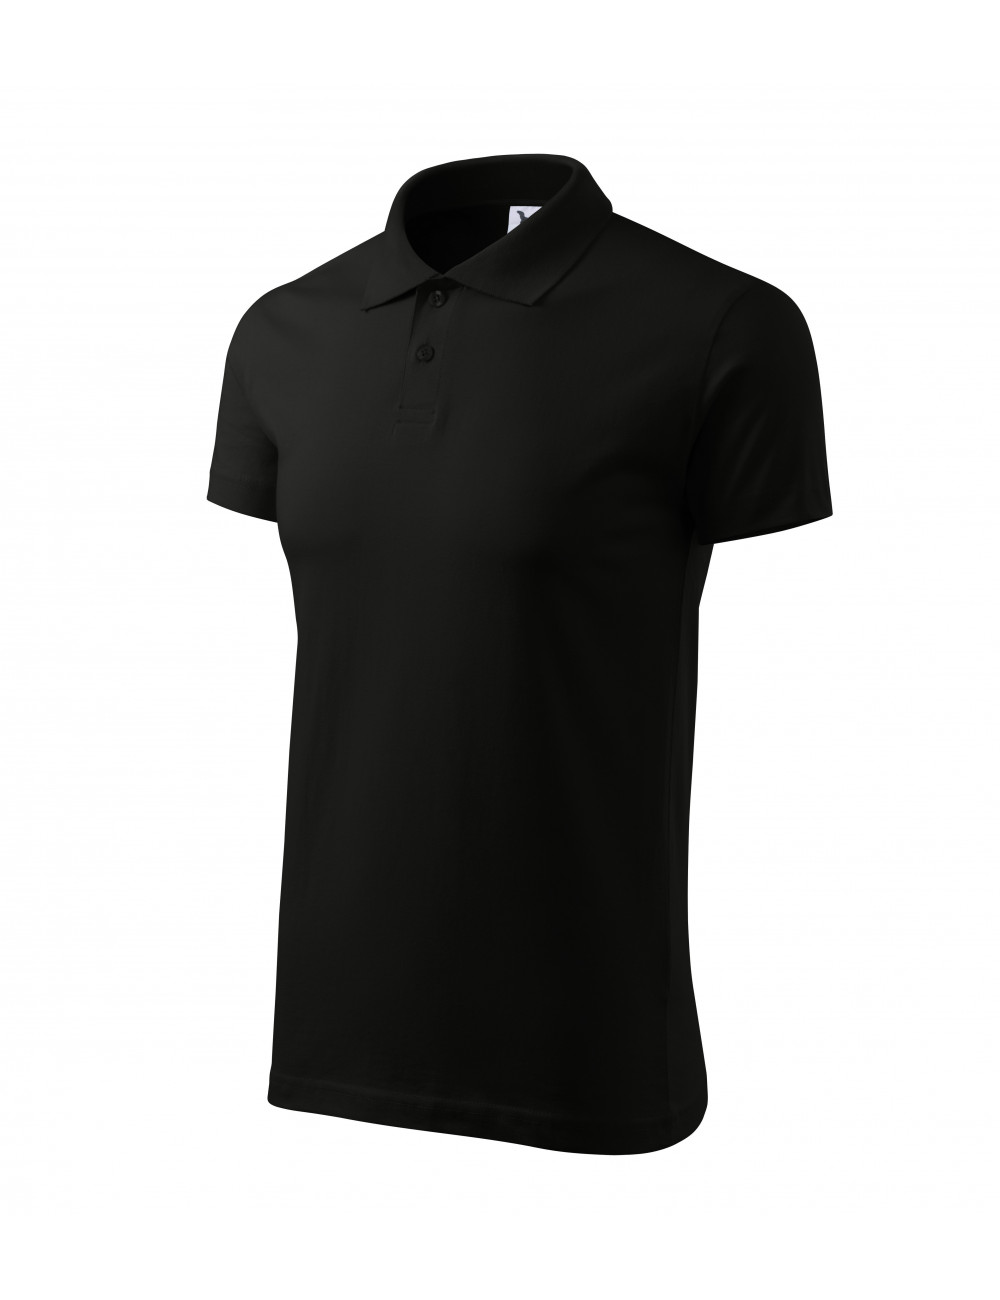 Adler MALFINI Koszulka polo męska Single J. 202 czarny